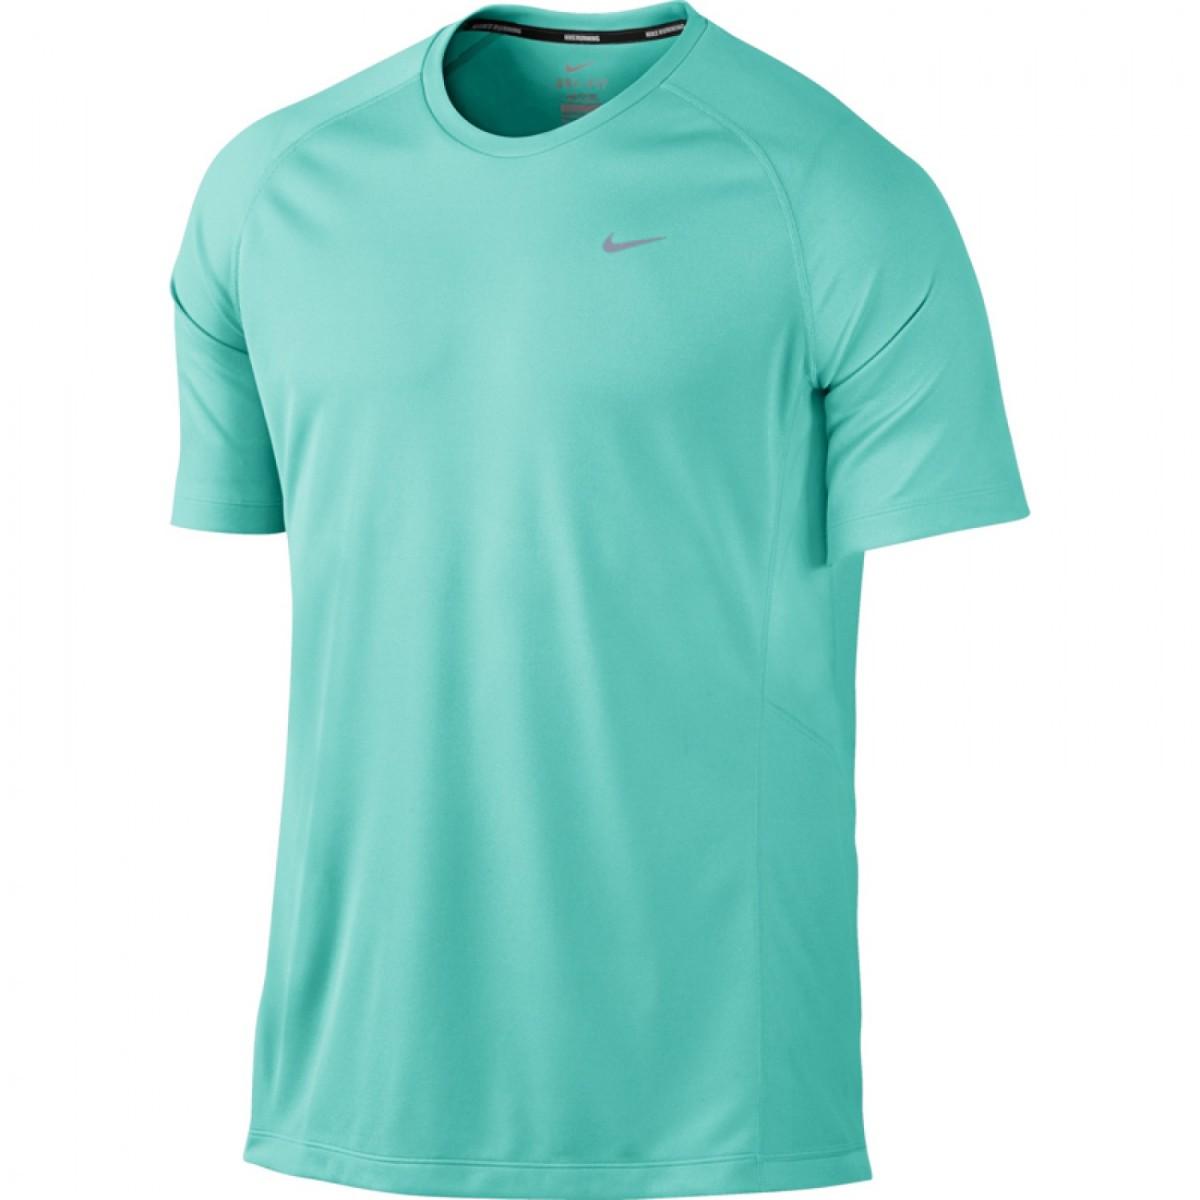 Camiseta Nike Manga Curta Miler SS UV  b33aef81296ff